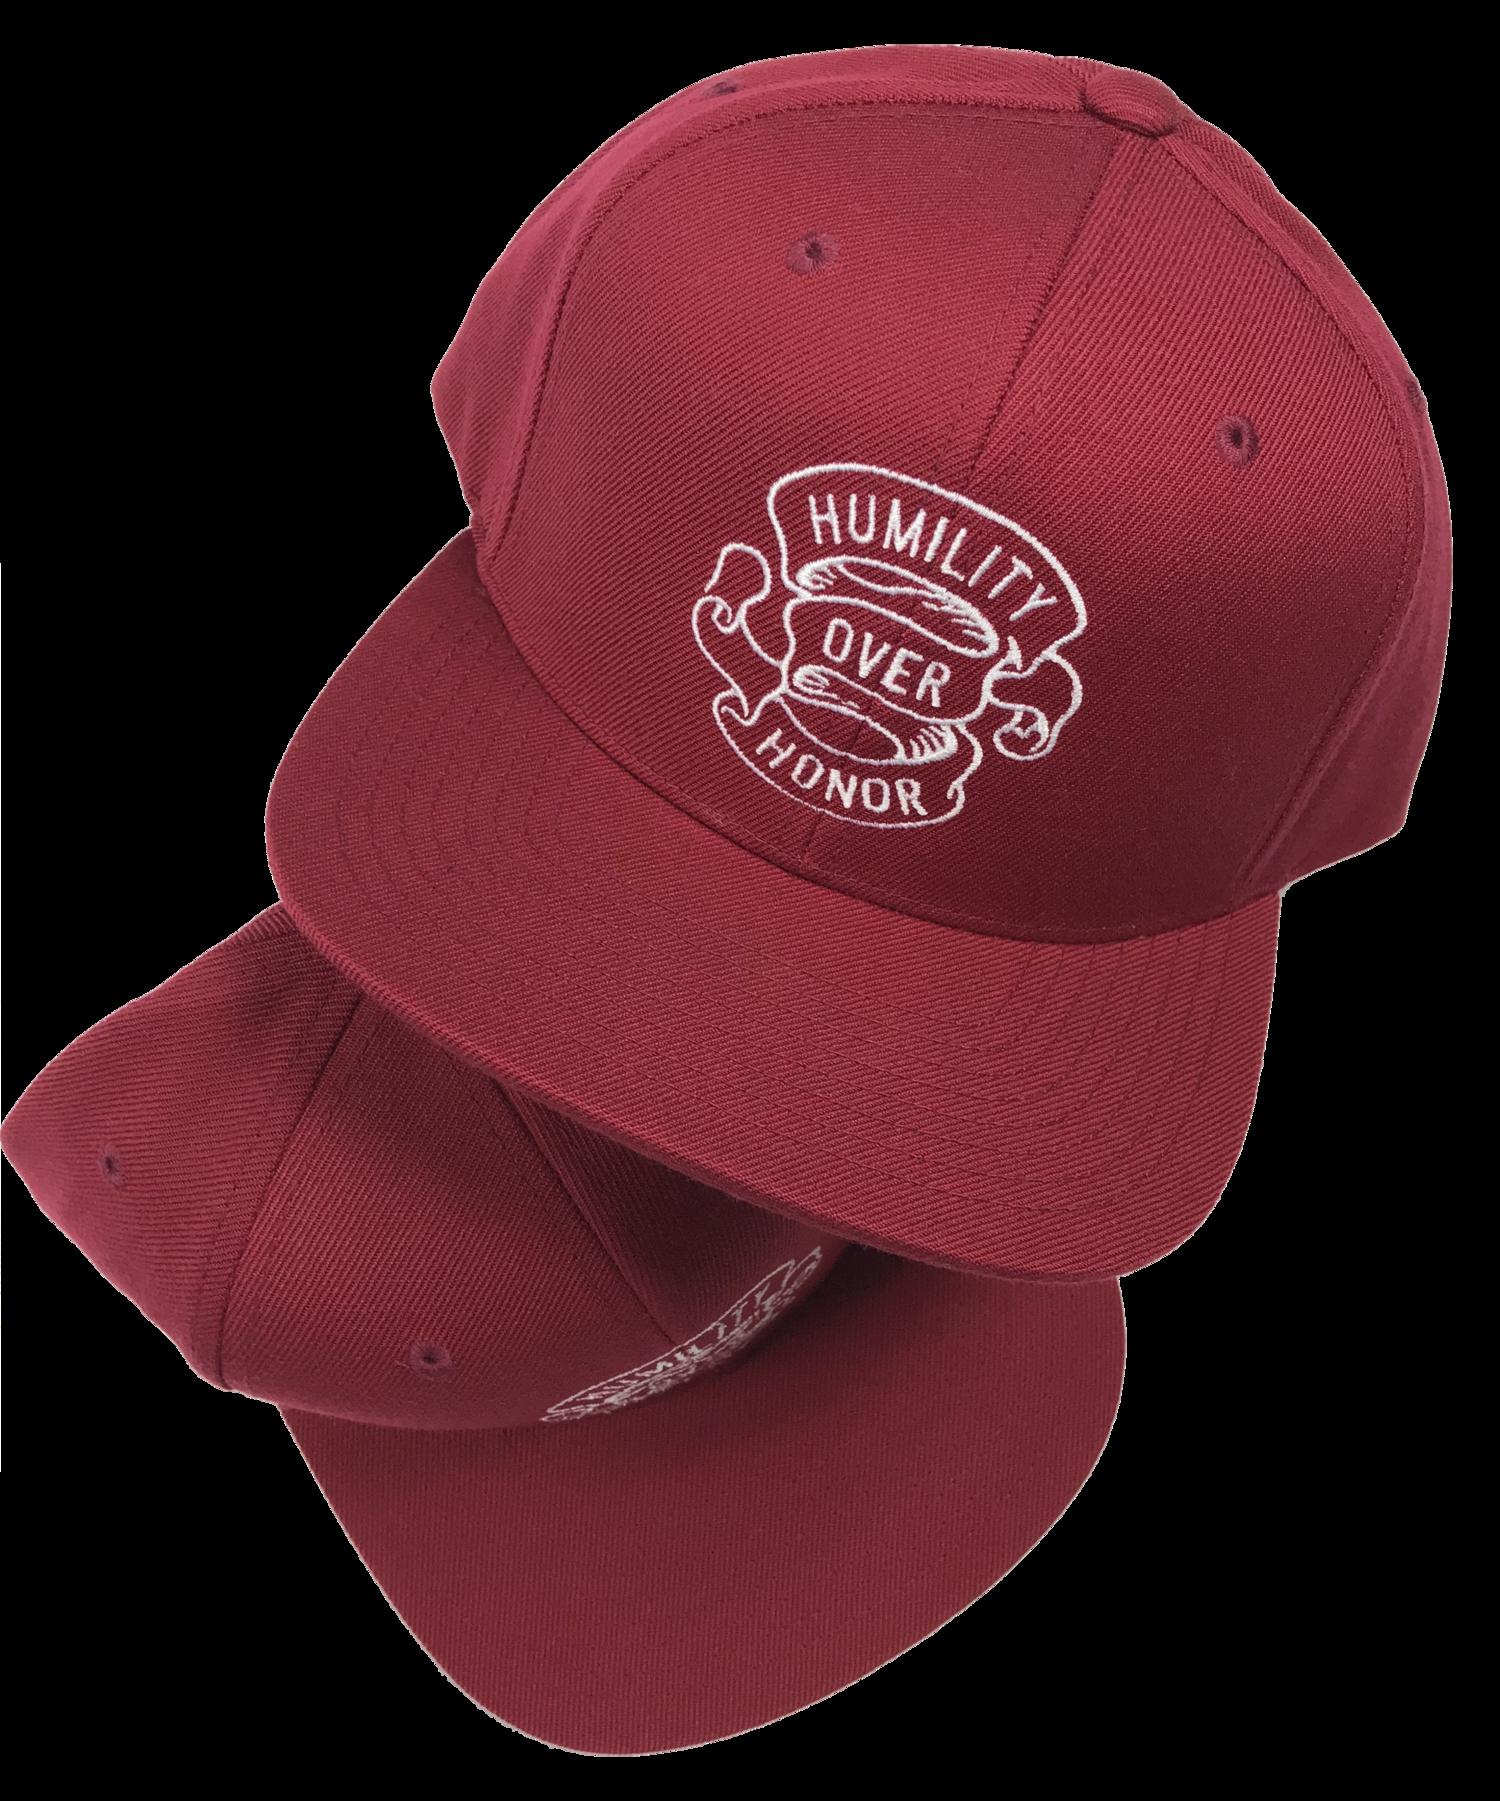 3f816b71d5950 Humility Over Honor Flat Bill Snapback - Maroon. 16.00 22.00. sale. HOH  Maroon.png